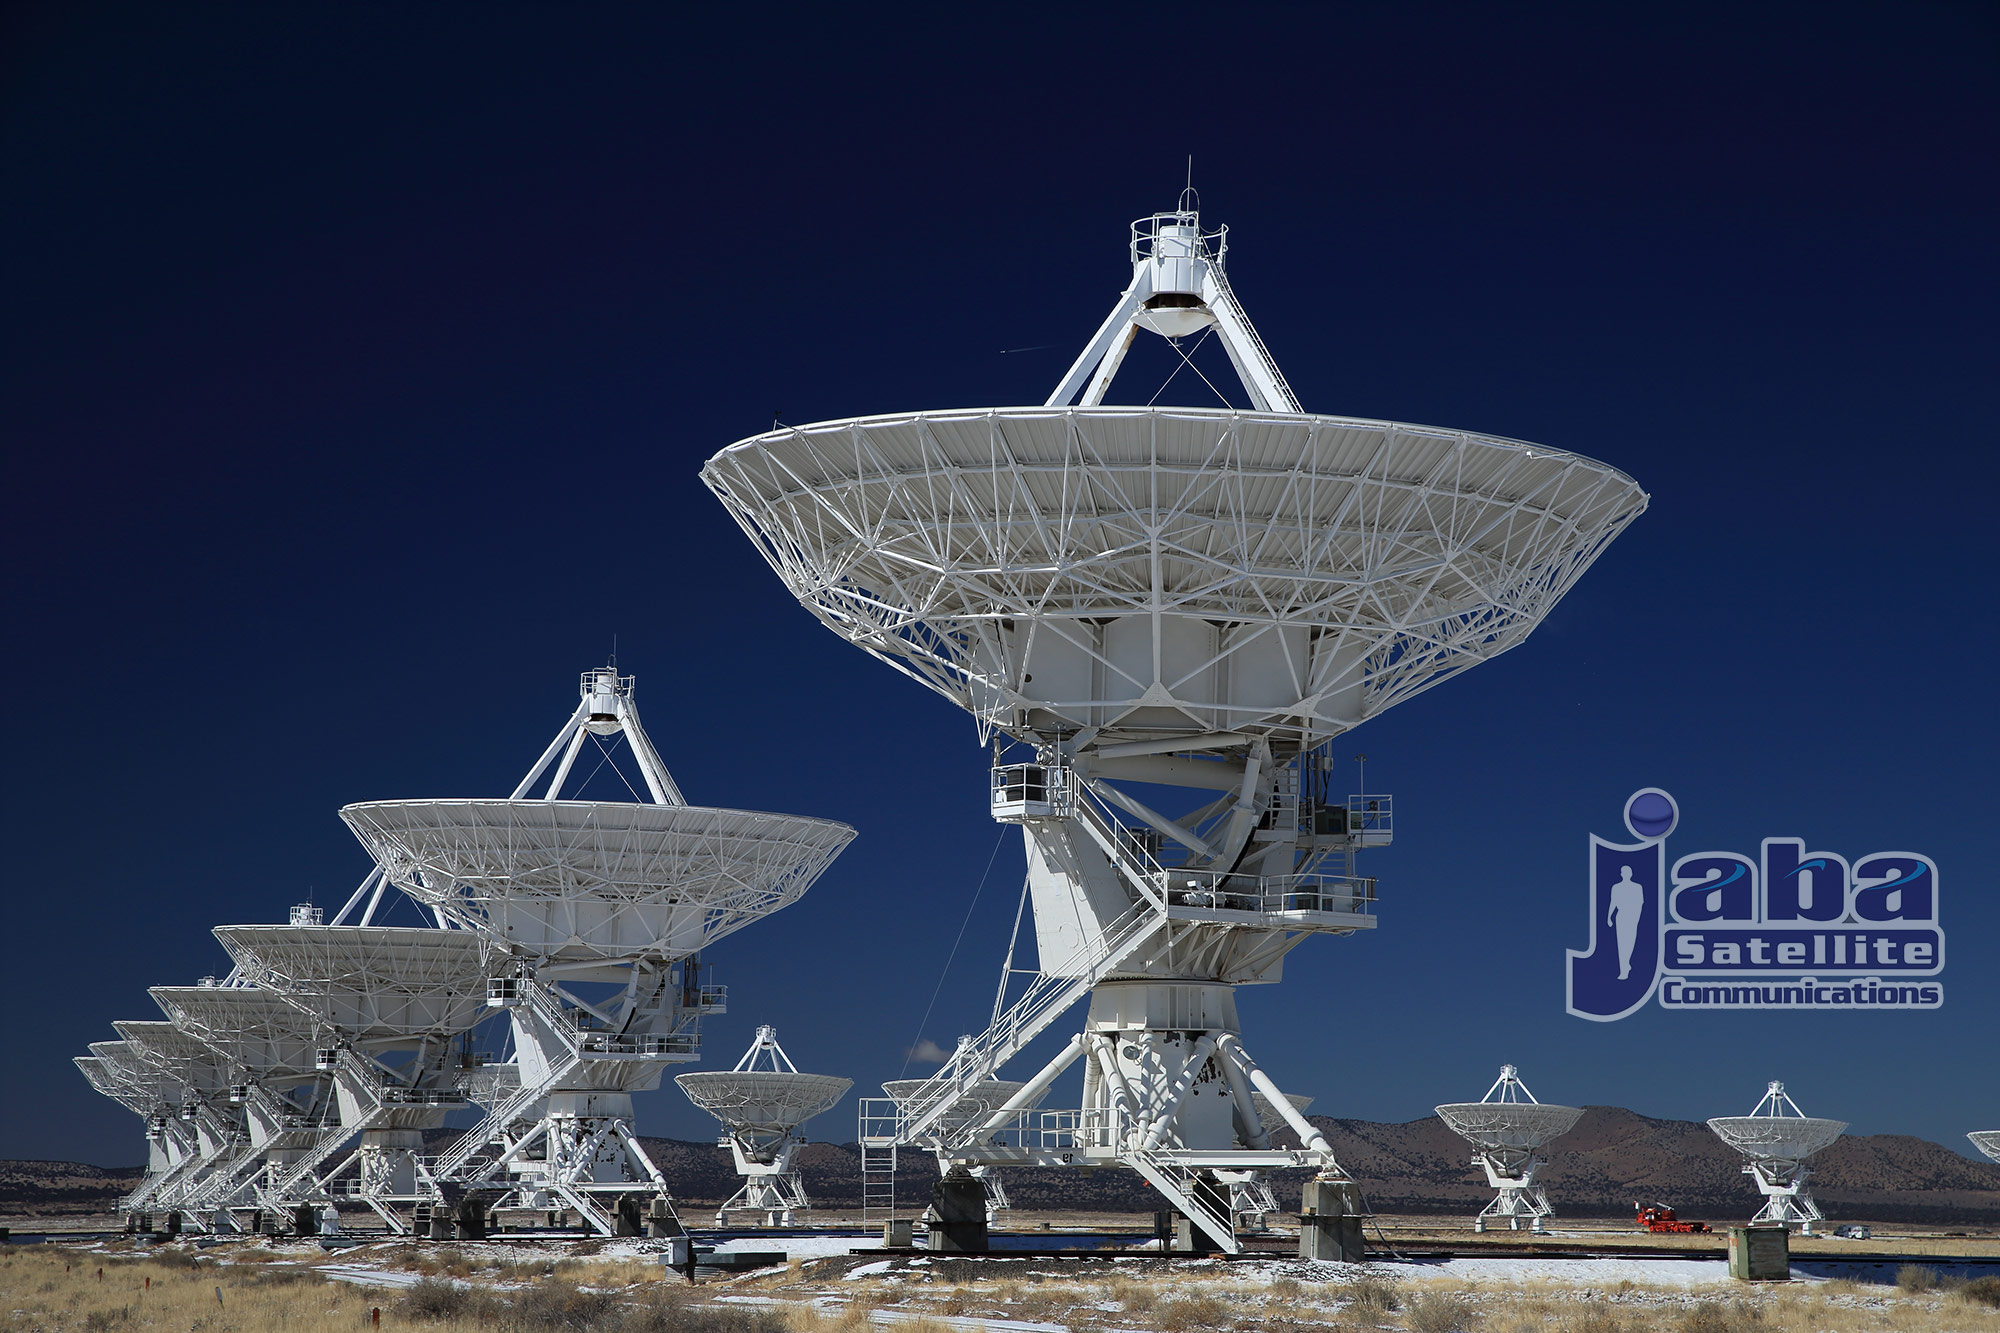 jabasat red satelital internet via satellite